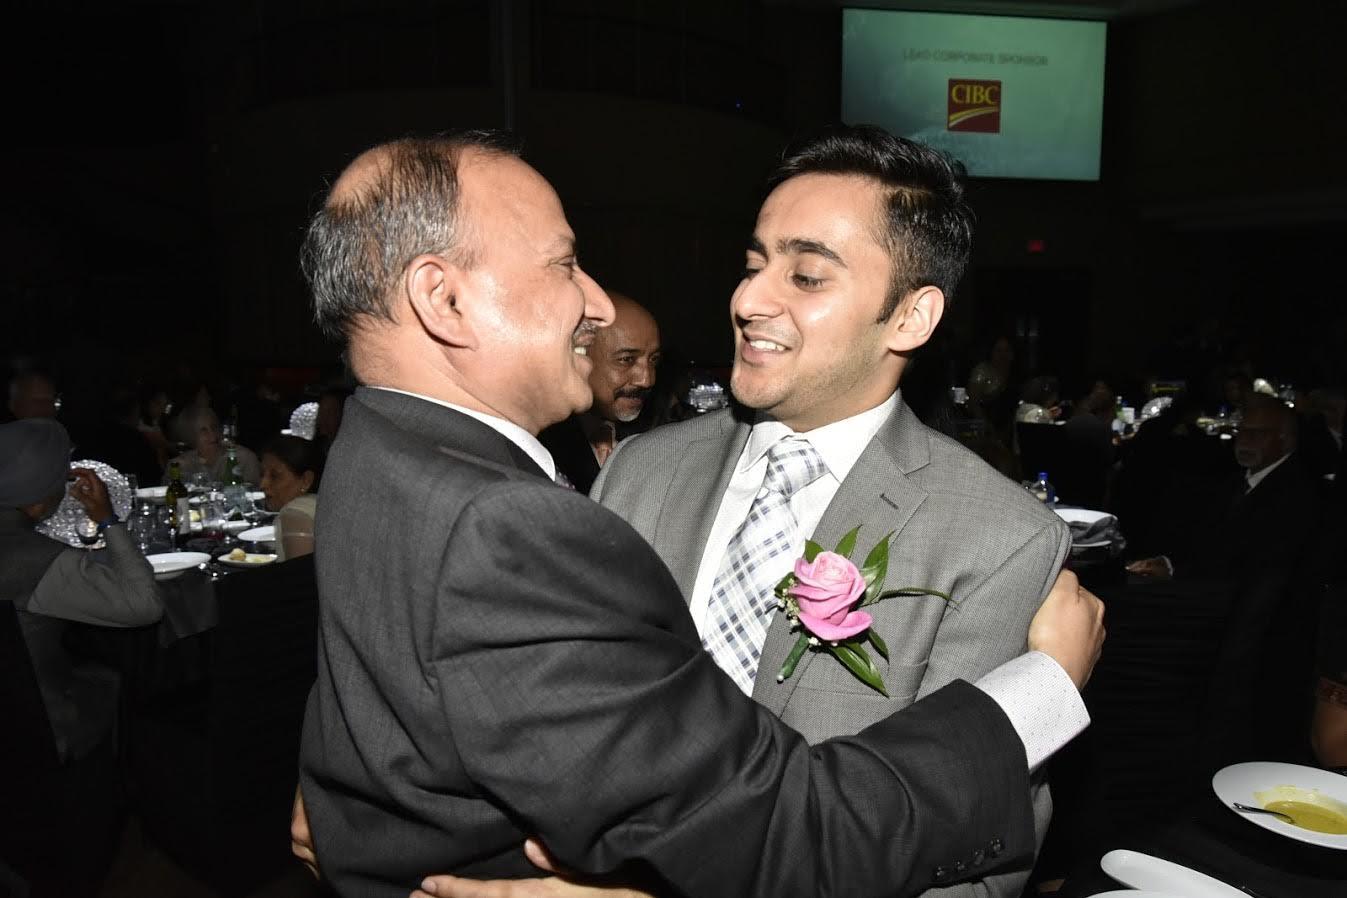 Abhishek Jain gets a hug from his father D.P. Jain on winning the ICCC award.